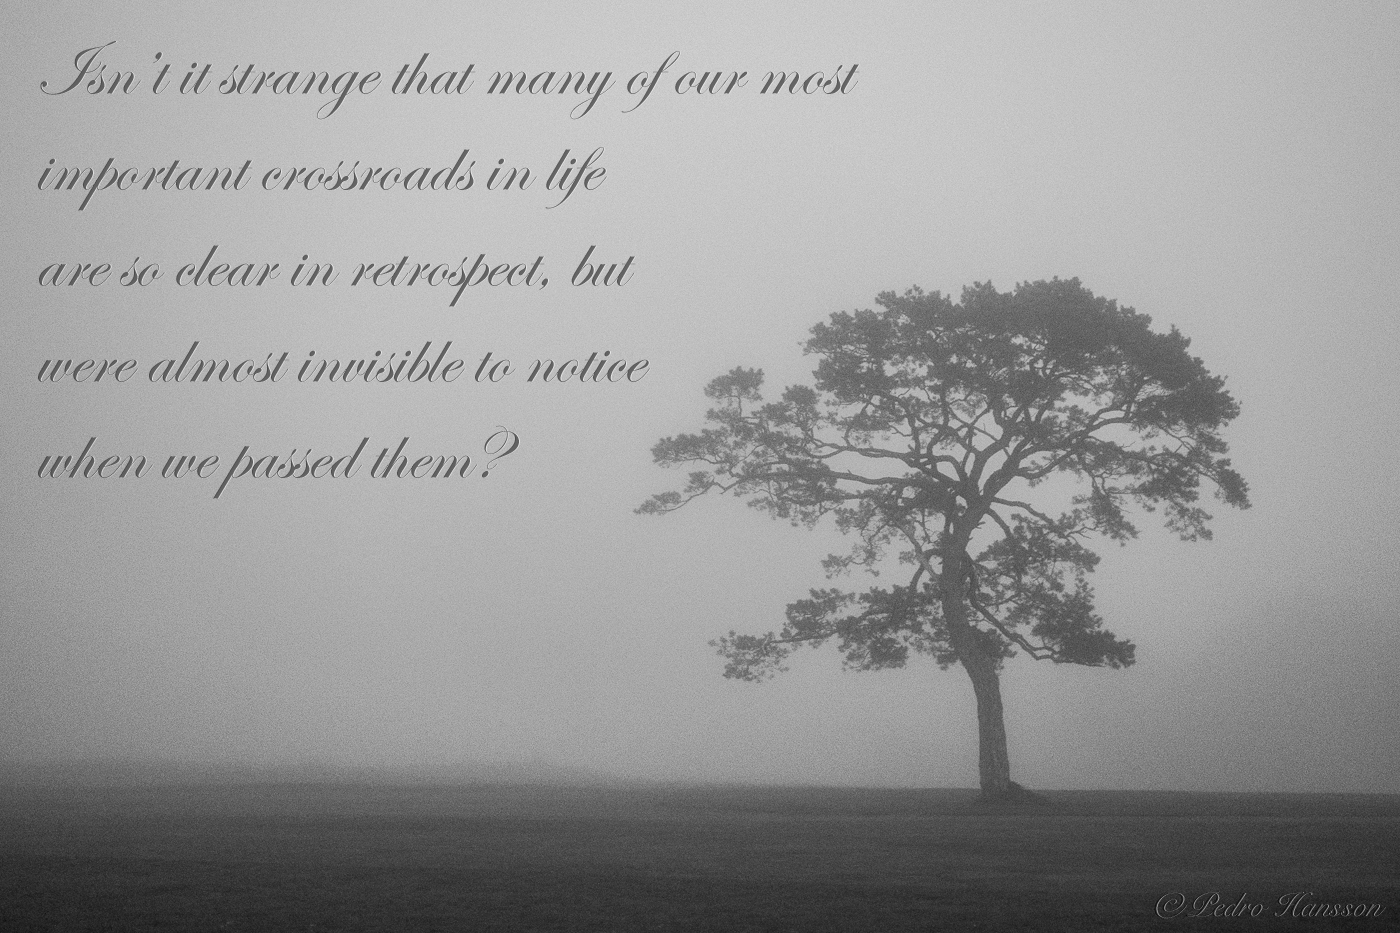 Crossroads of Life | VoiceAmerica Press Blog | Internet ... |Crossroads Of Life